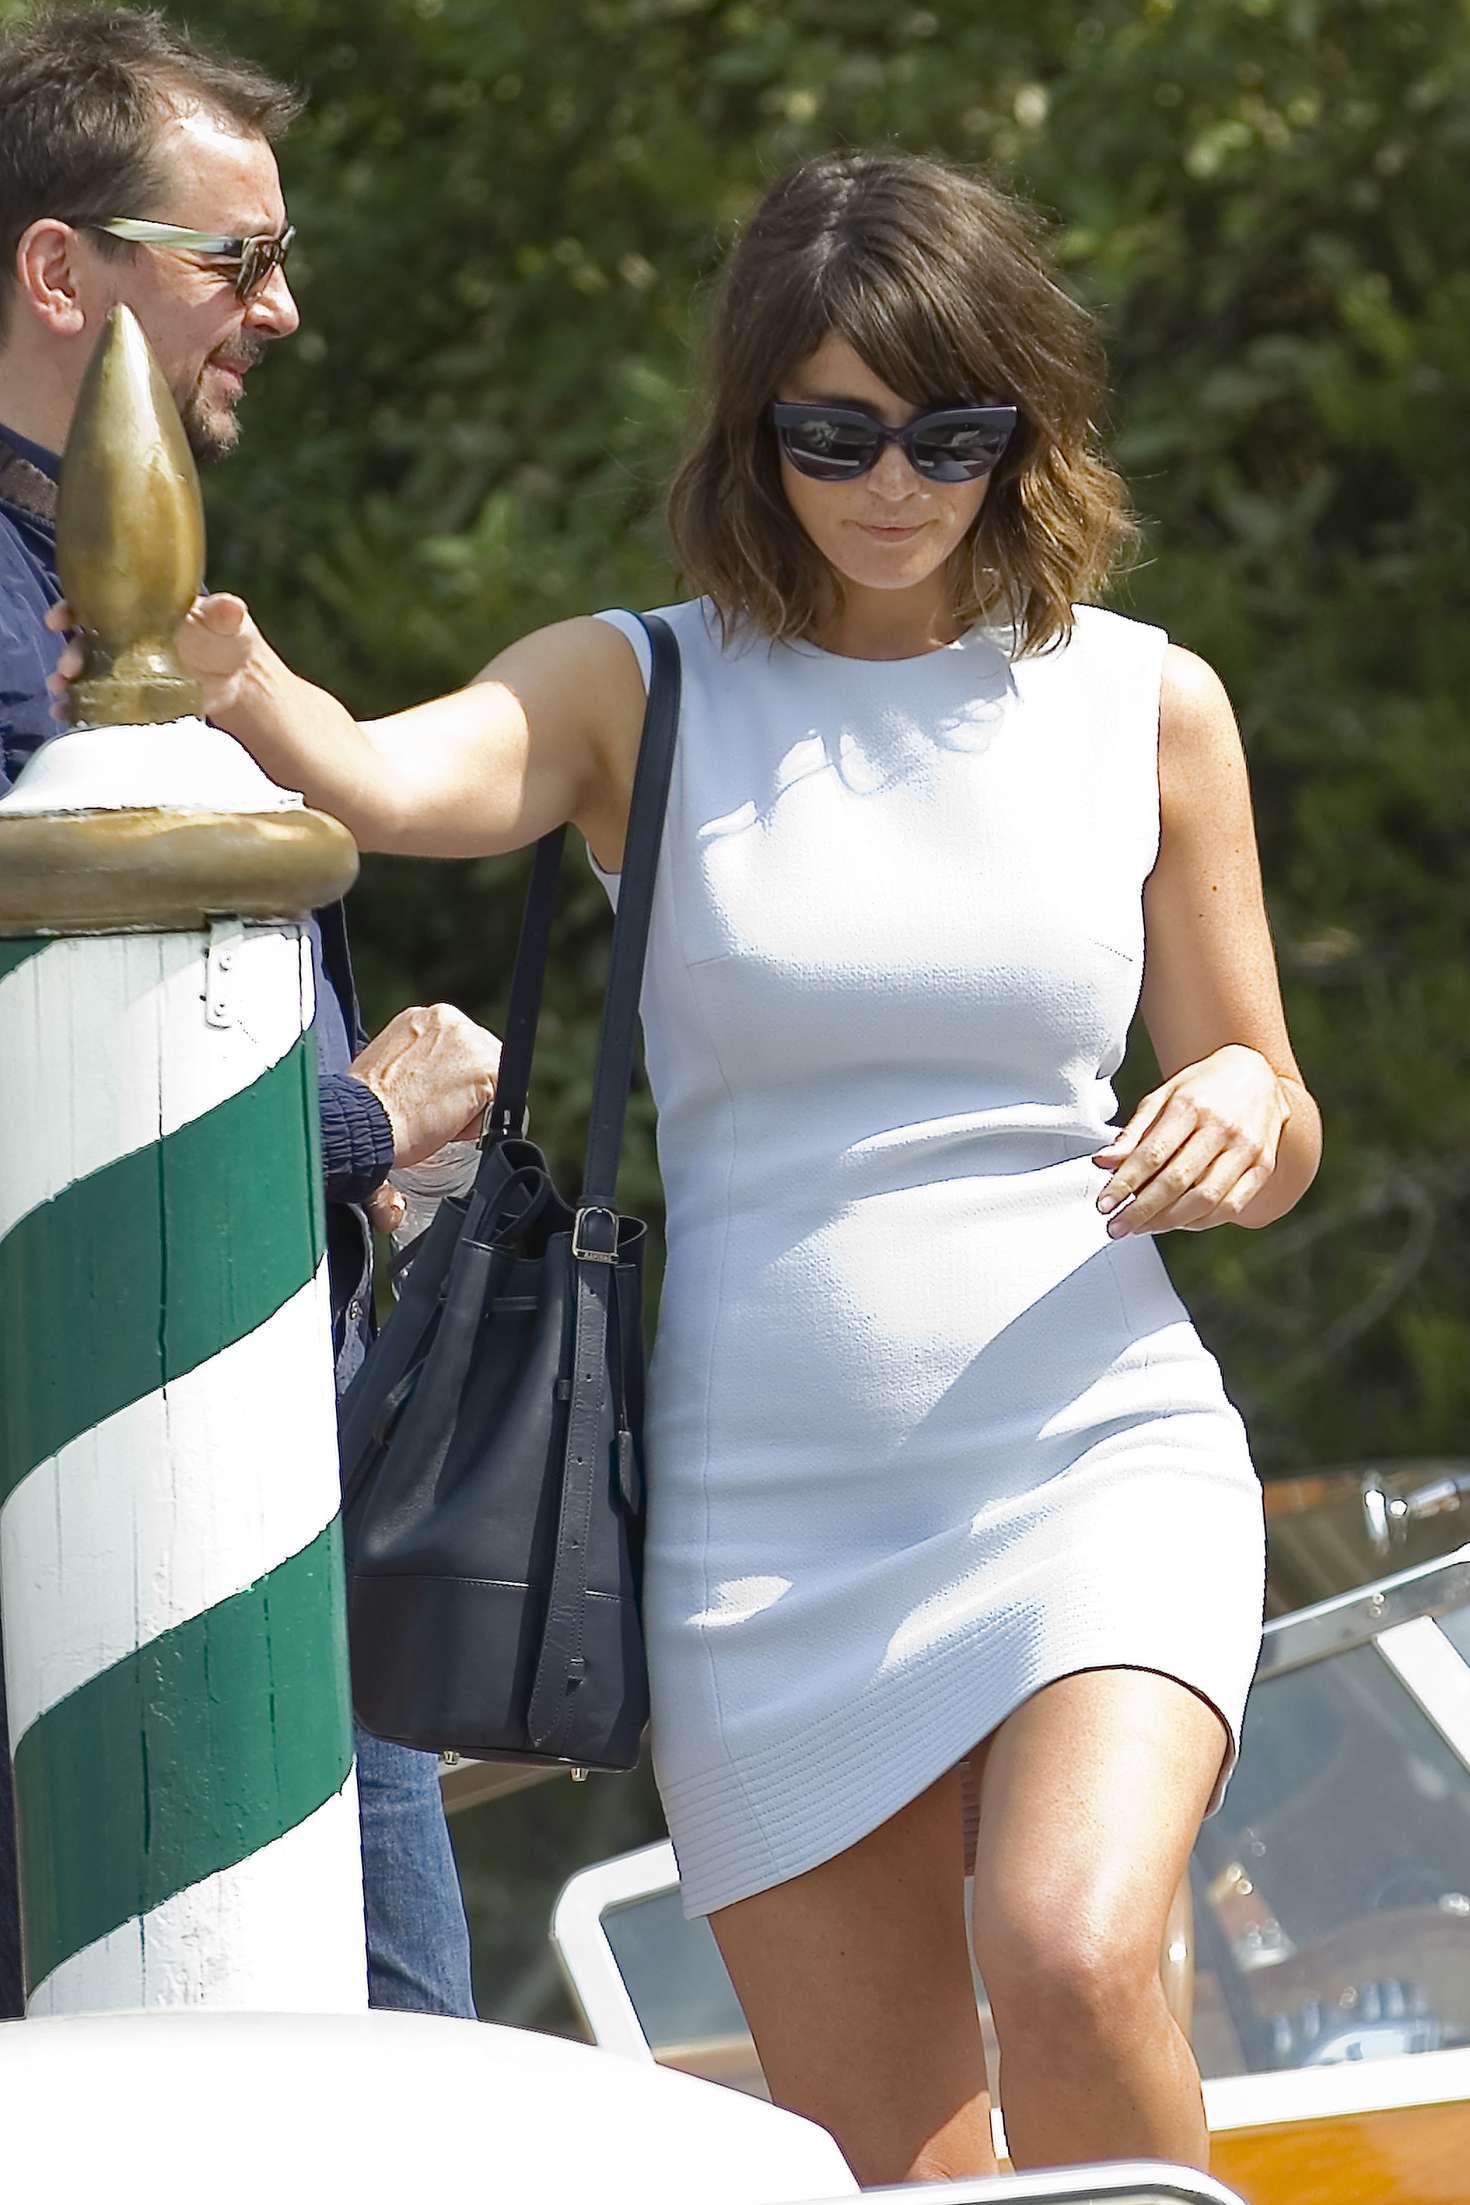 Gemma Arterton In Mini Dress Leaving Excelsior Hotel In Venice